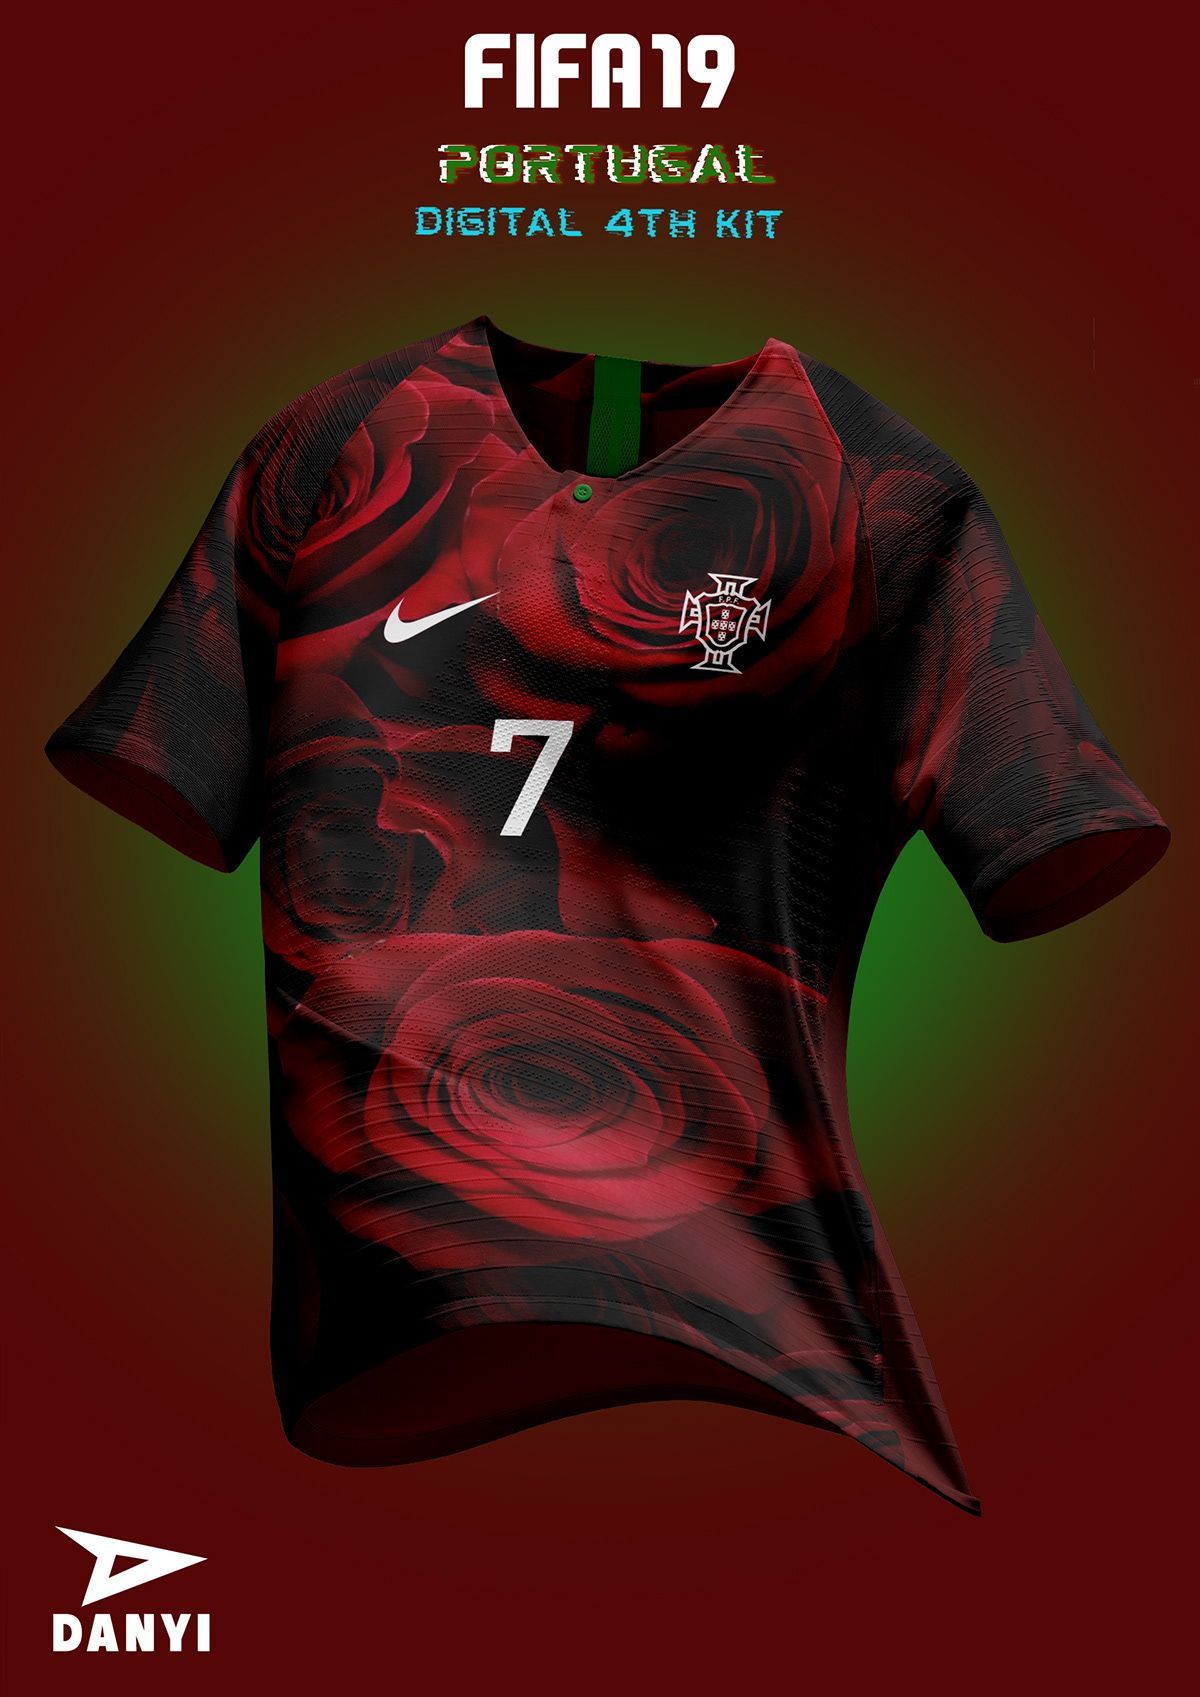 FIFA 19 X NIKE football kits. on Behance   Camisa de futebol